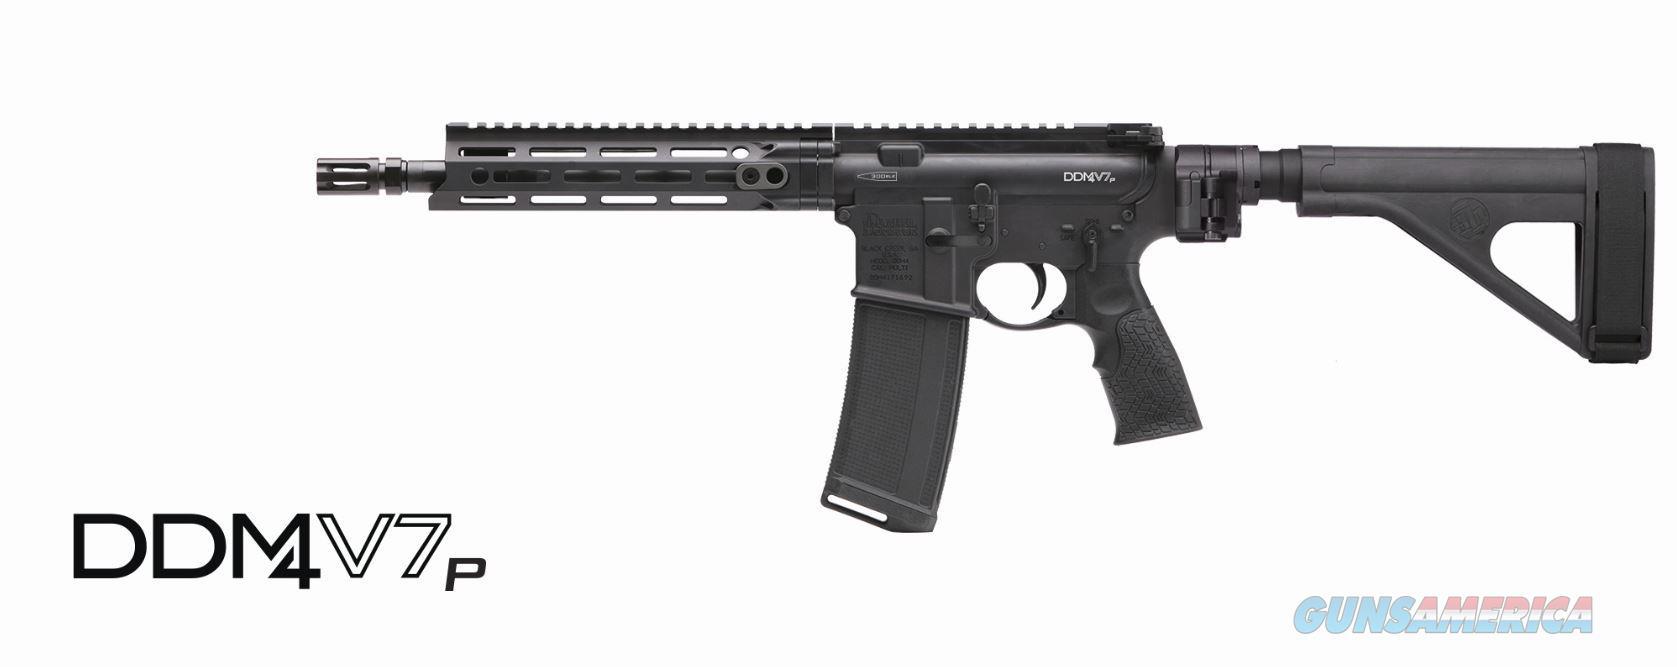 Daniel Defense Ddm4 V7 Tact Pistol 02-128-08252  Guns > Pistols > D Misc Pistols